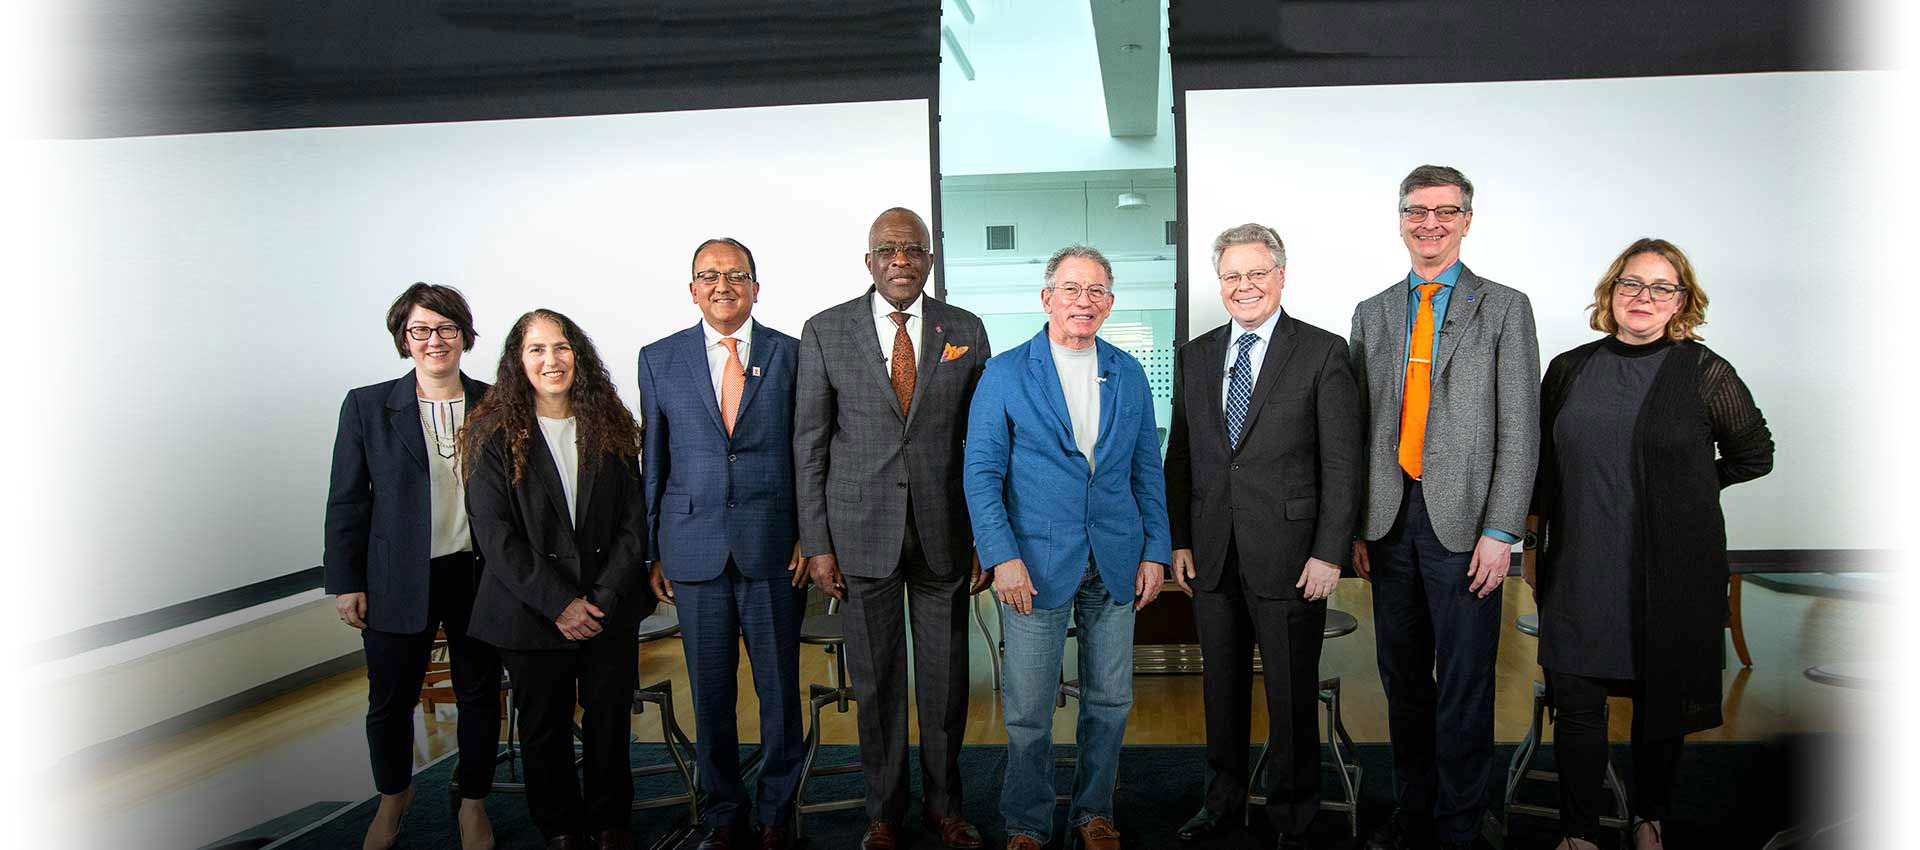 C3.ai hosts University of Illinois at Urbana-Champaign leaders